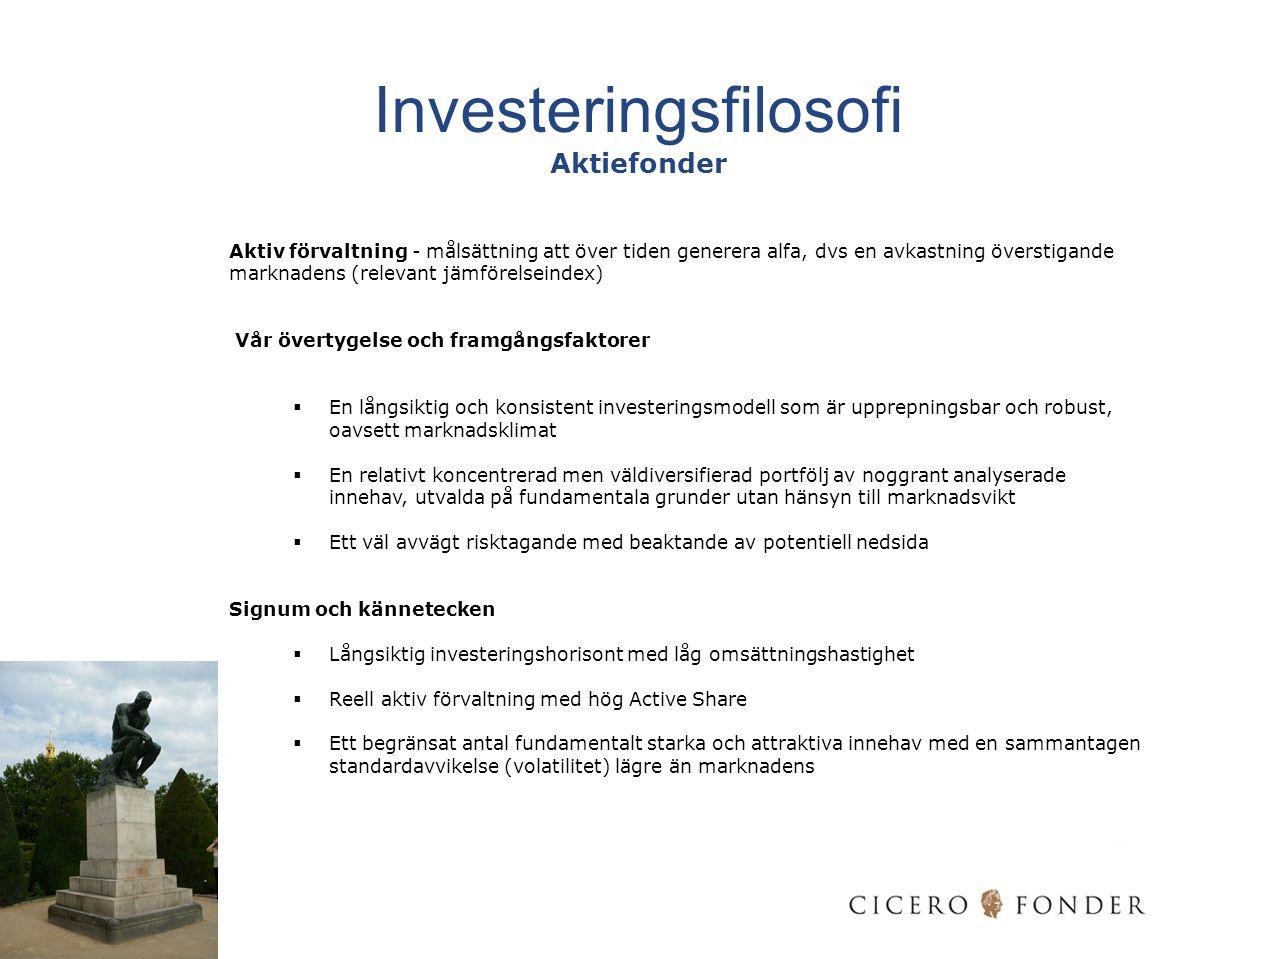 Investeringsfilosofi Aktiefonder